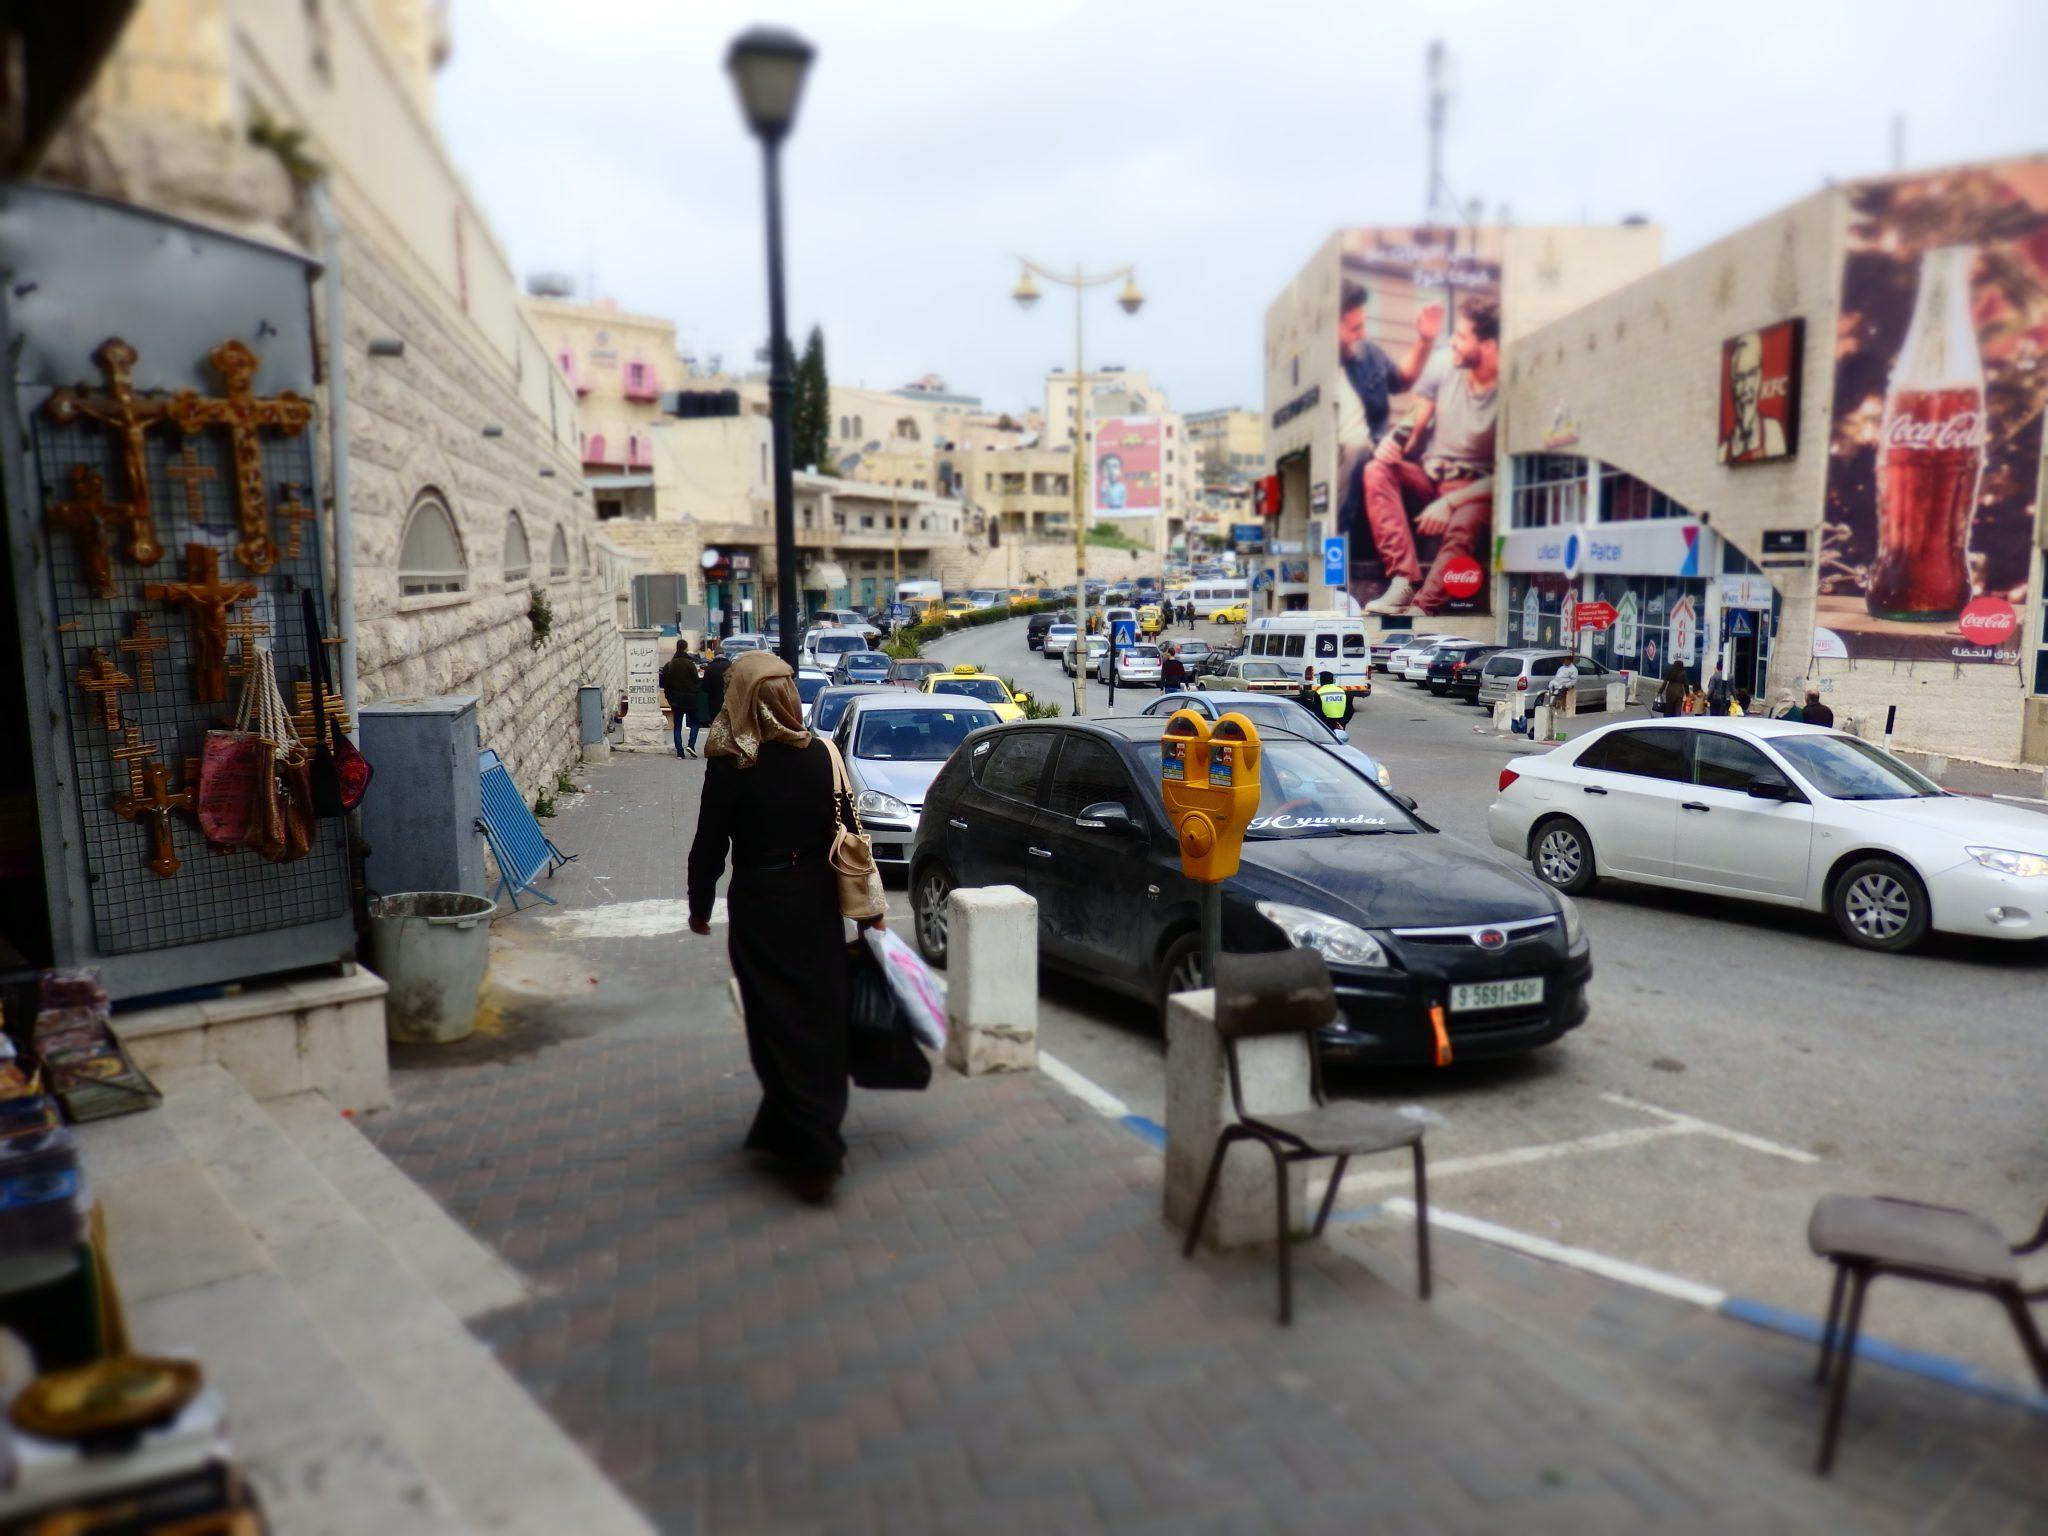 a busy shopping street near where the tour begins